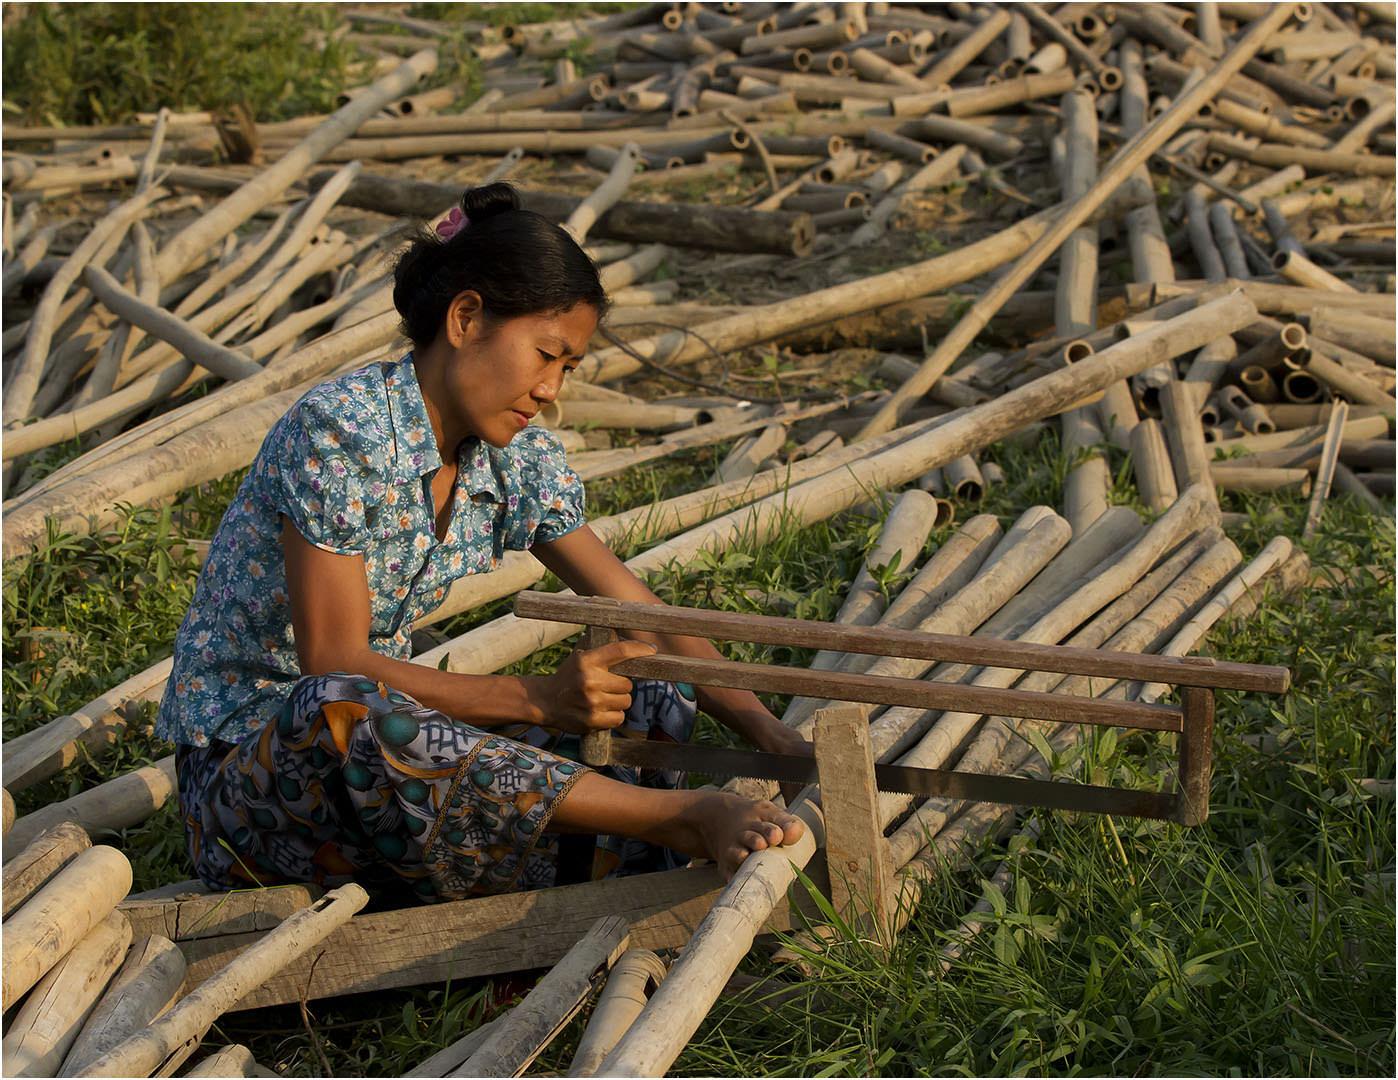 The Bamboo Trade